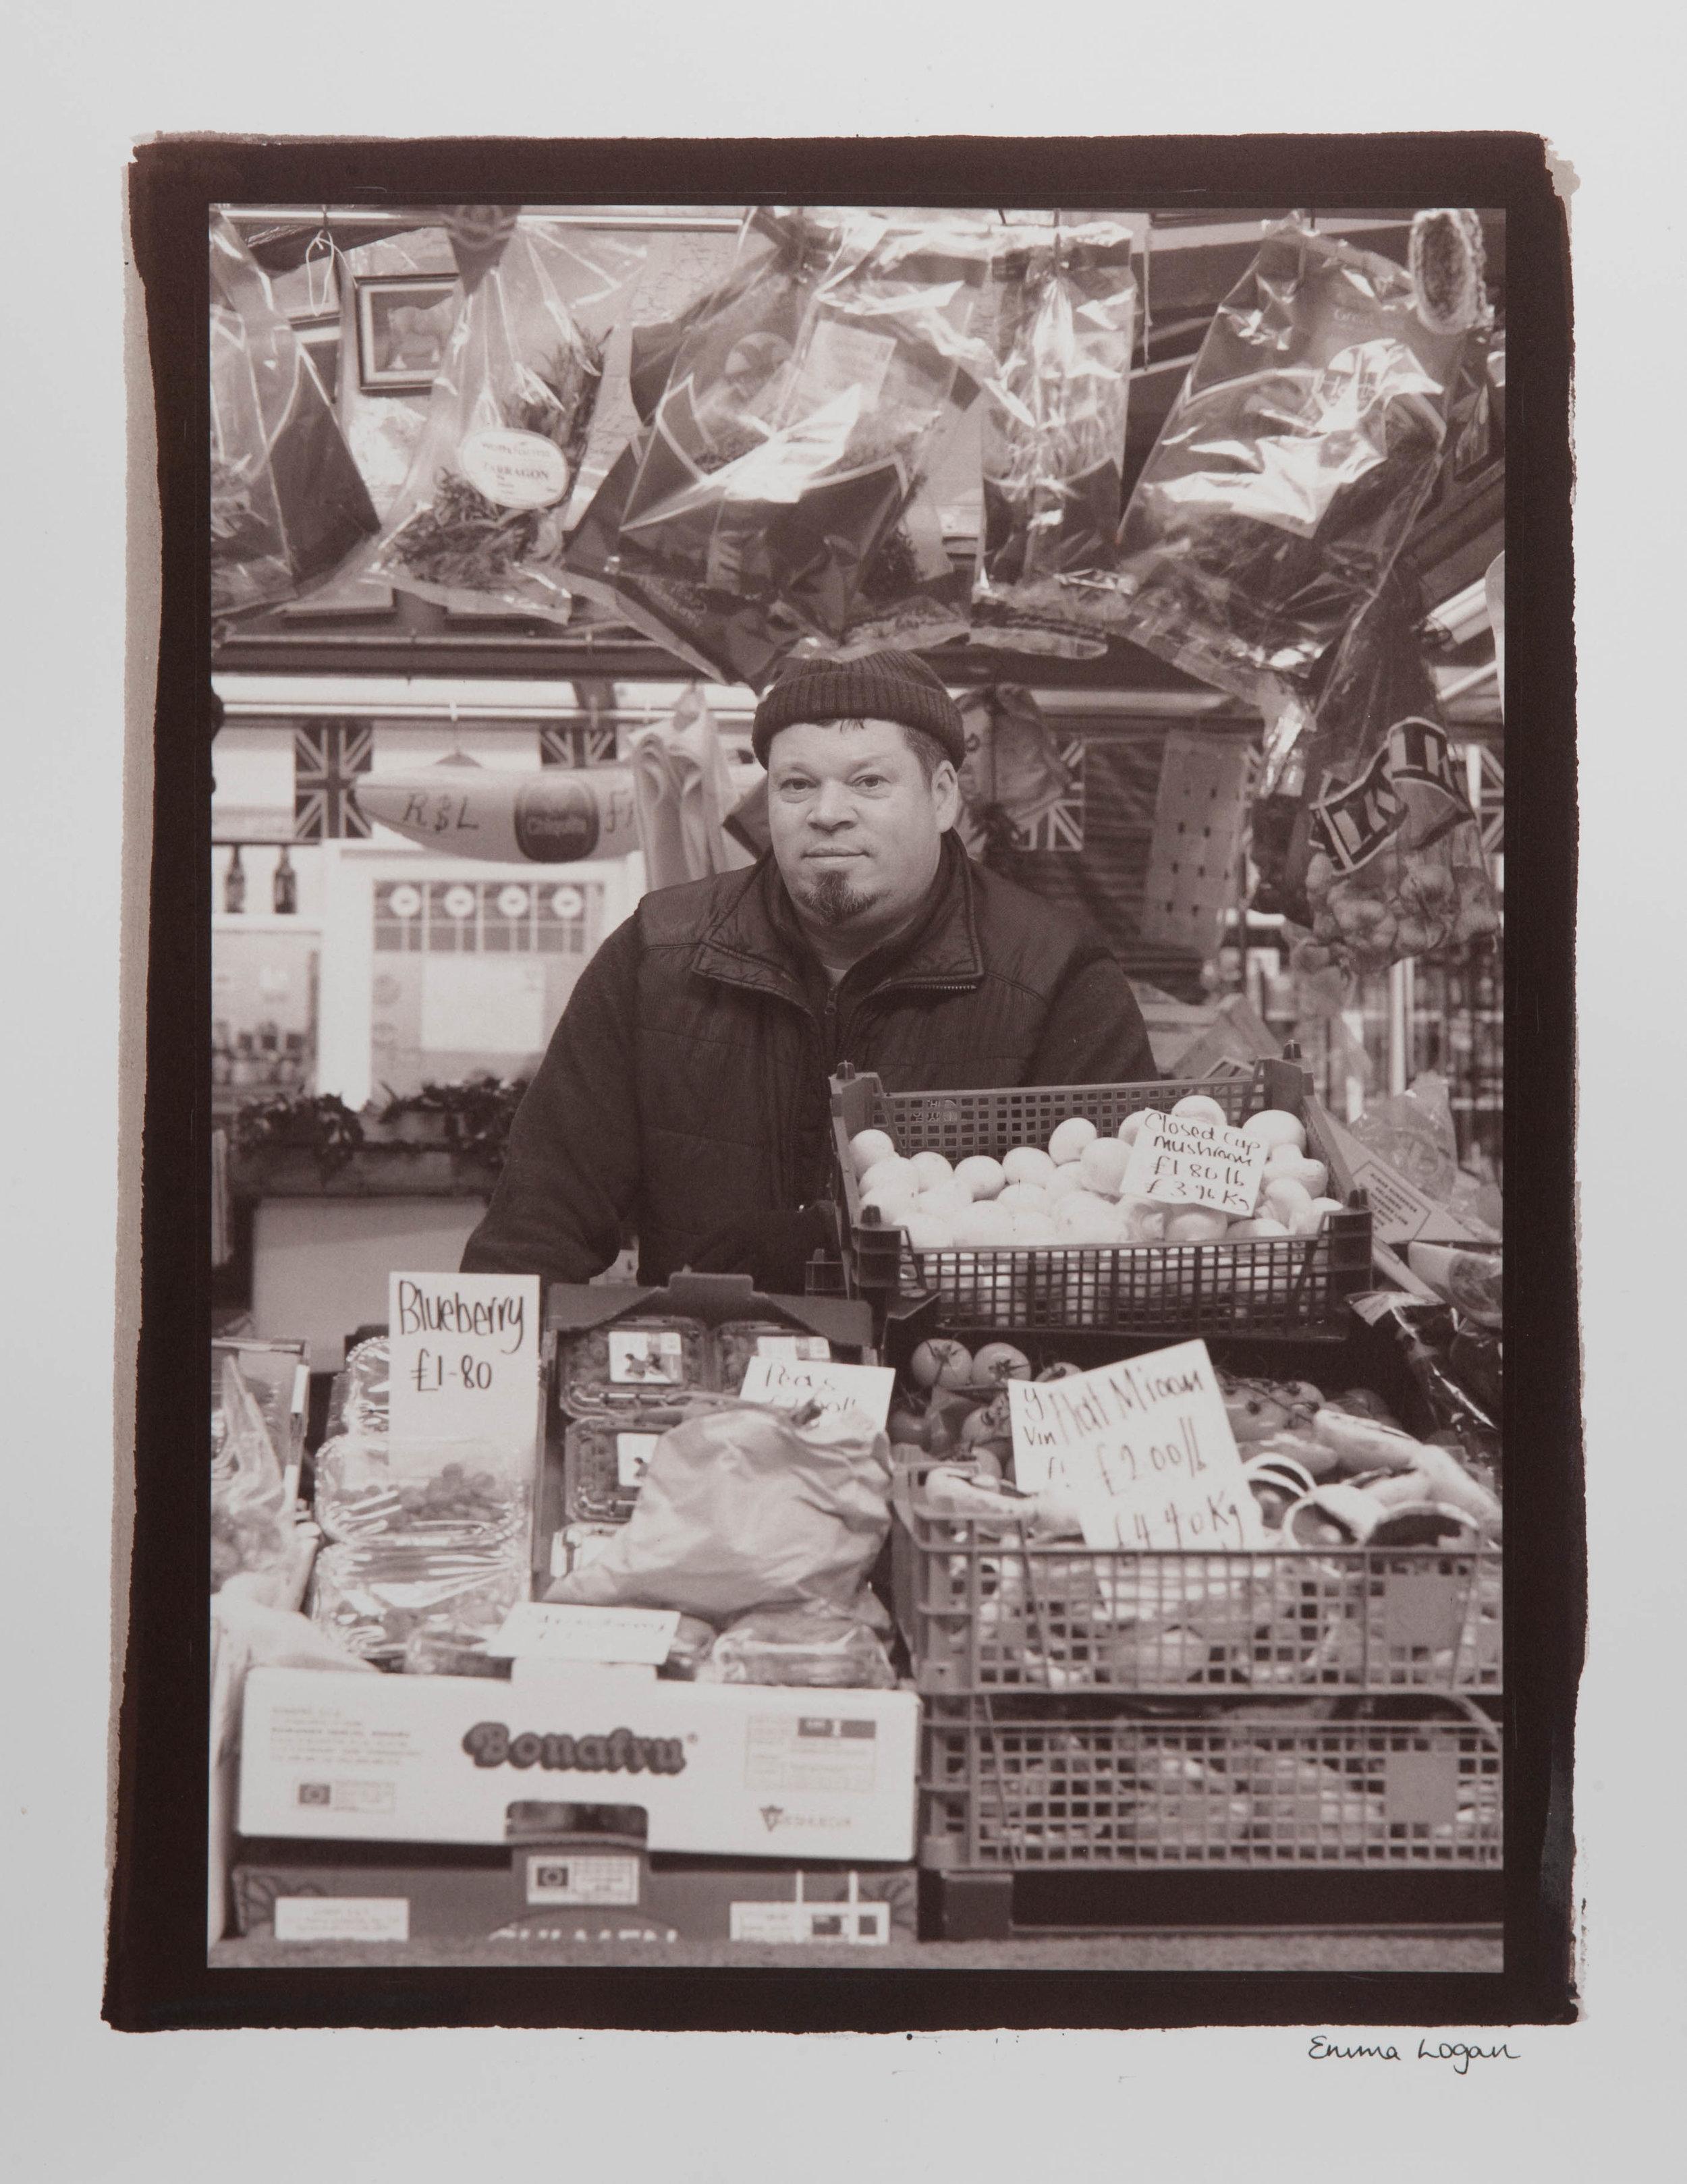 "The Derby Market Hall.Digital Negative Salt Prints. Original size - 16x20""."